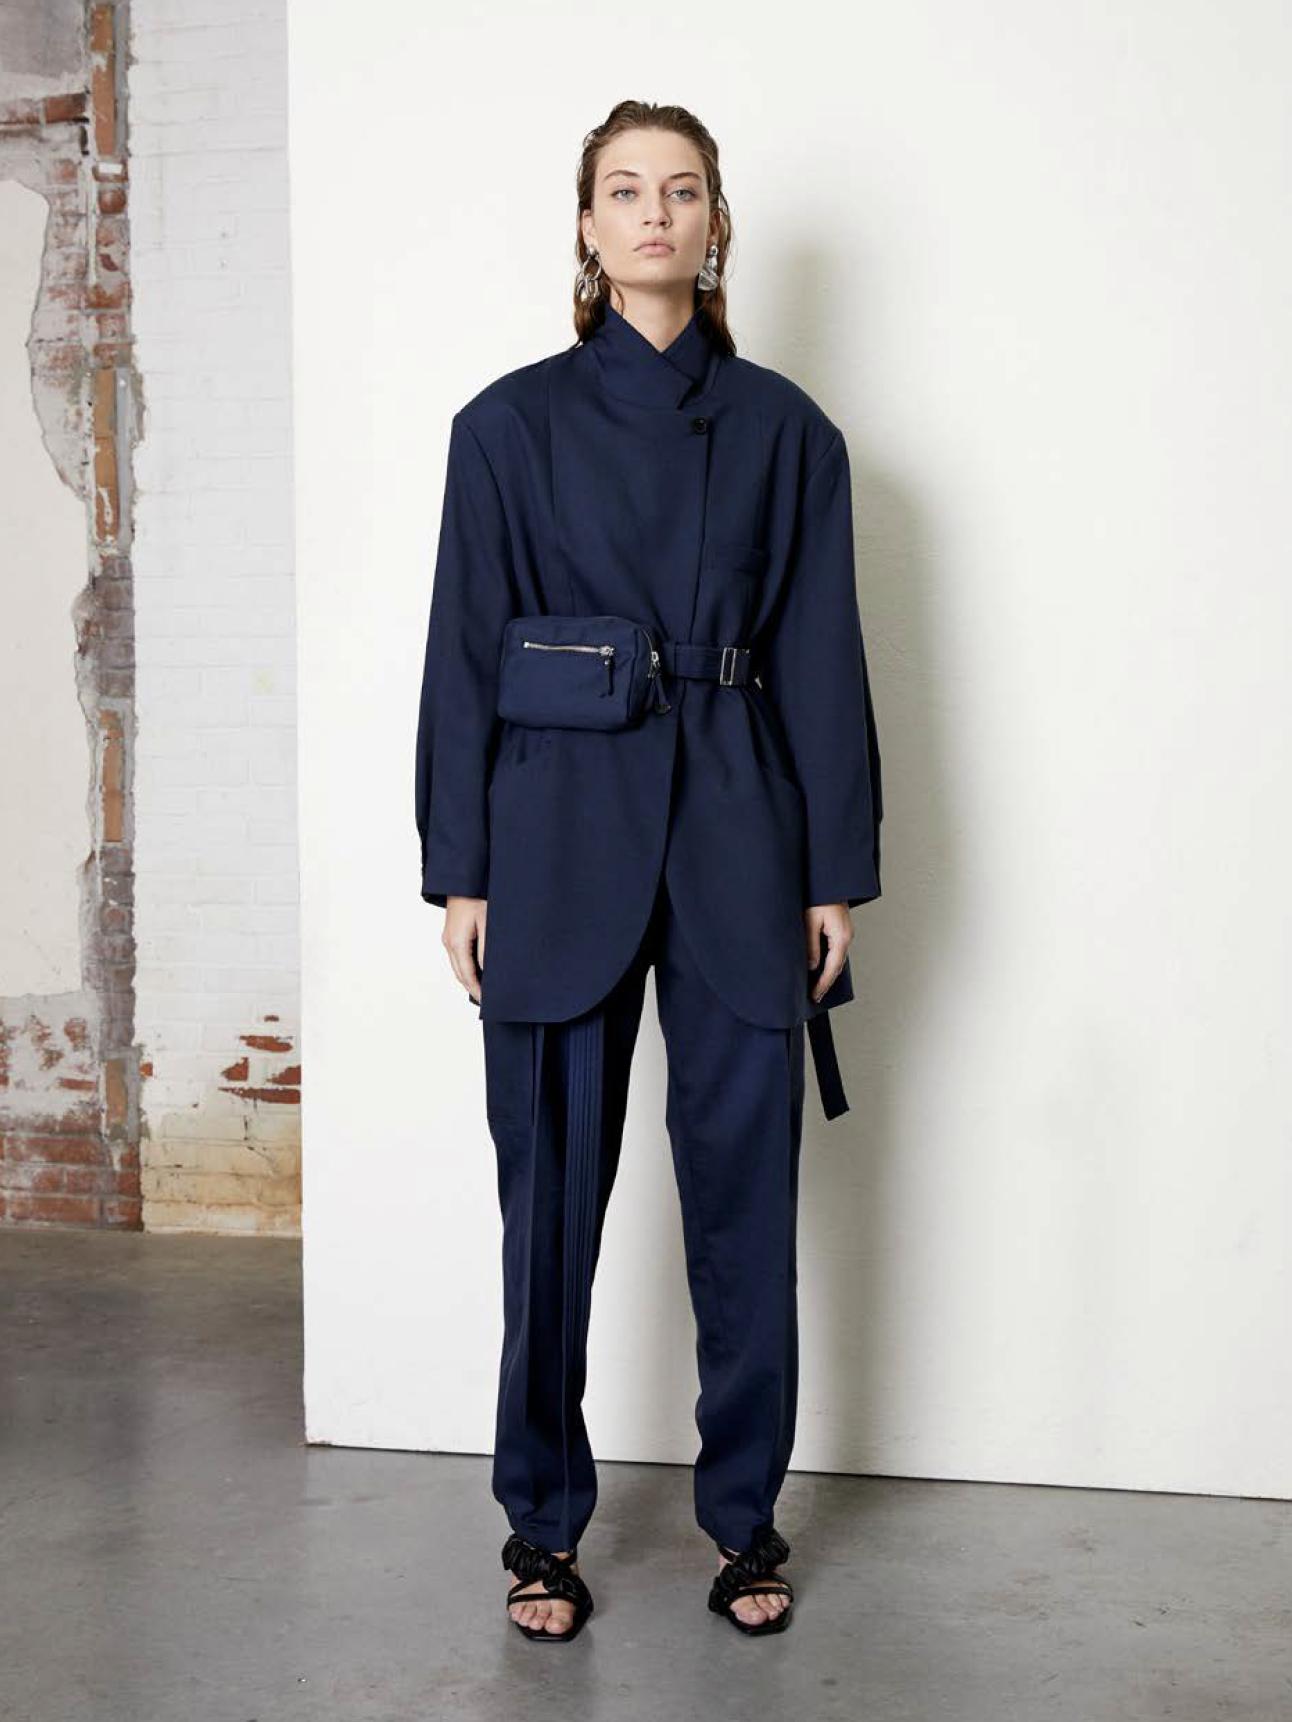 <strong>FRENKEN</strong>drop out light wool suiting blazer